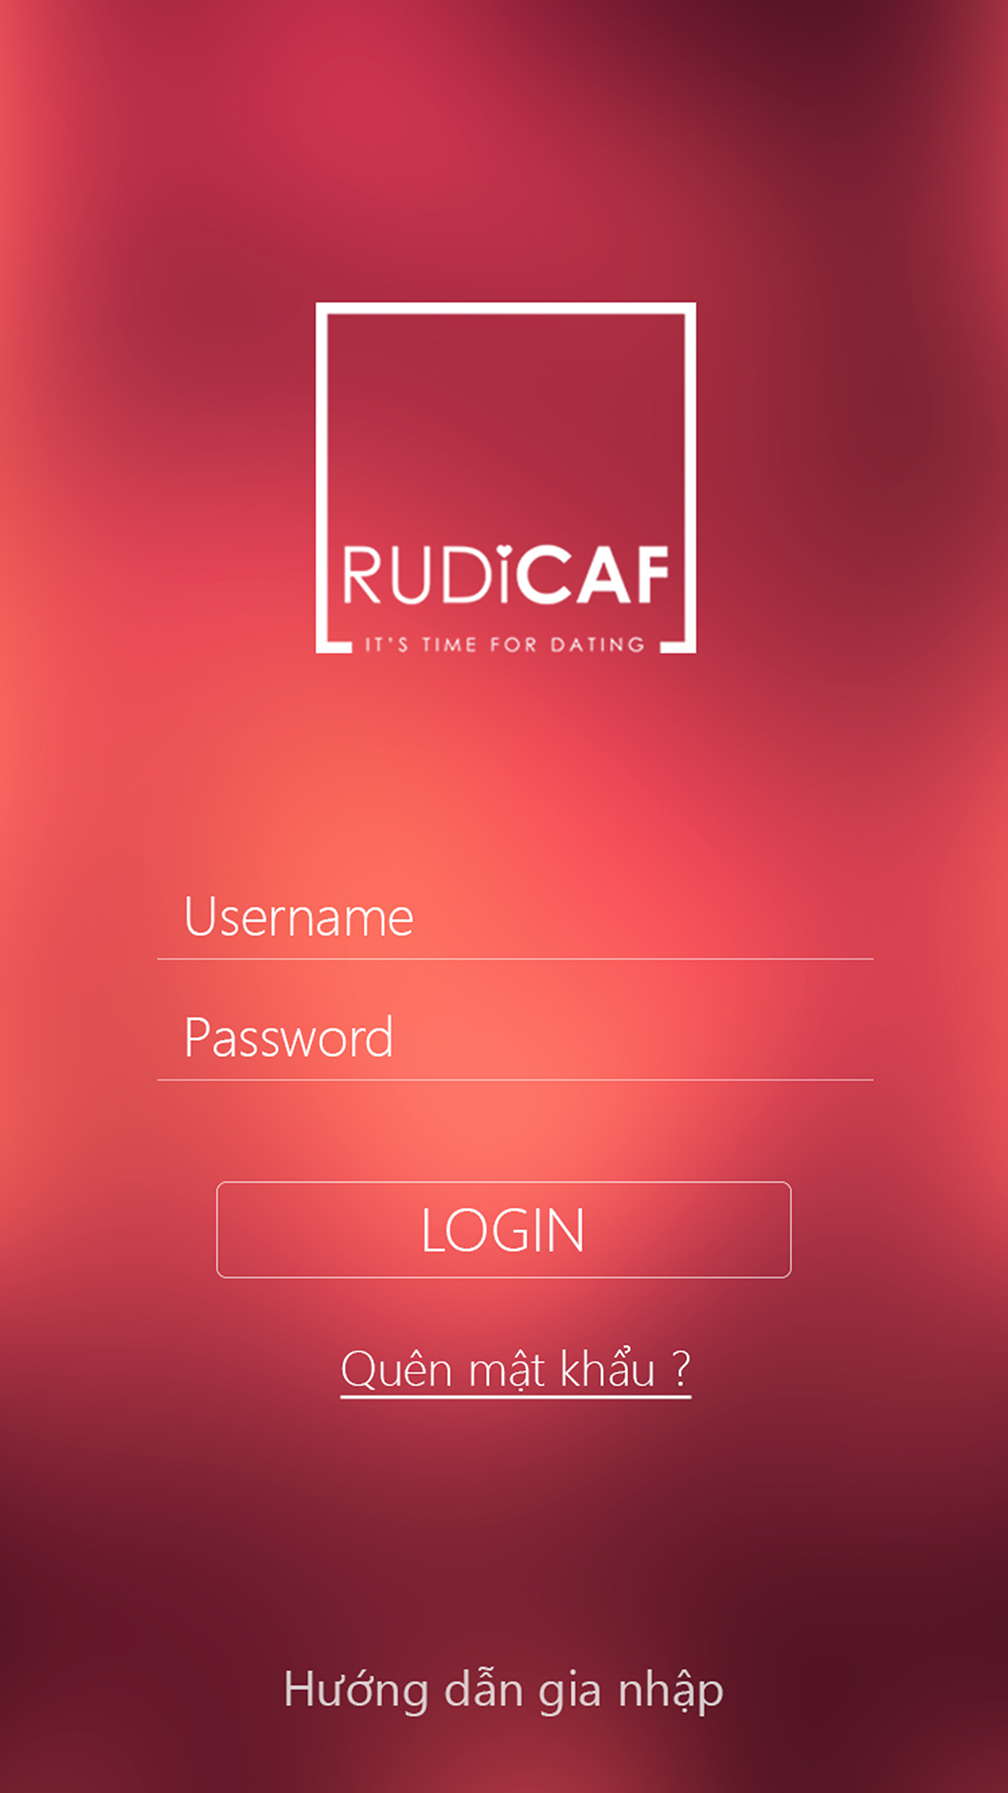 Giao diện ứng dụng book lịch hẹn hò Rudicaf.